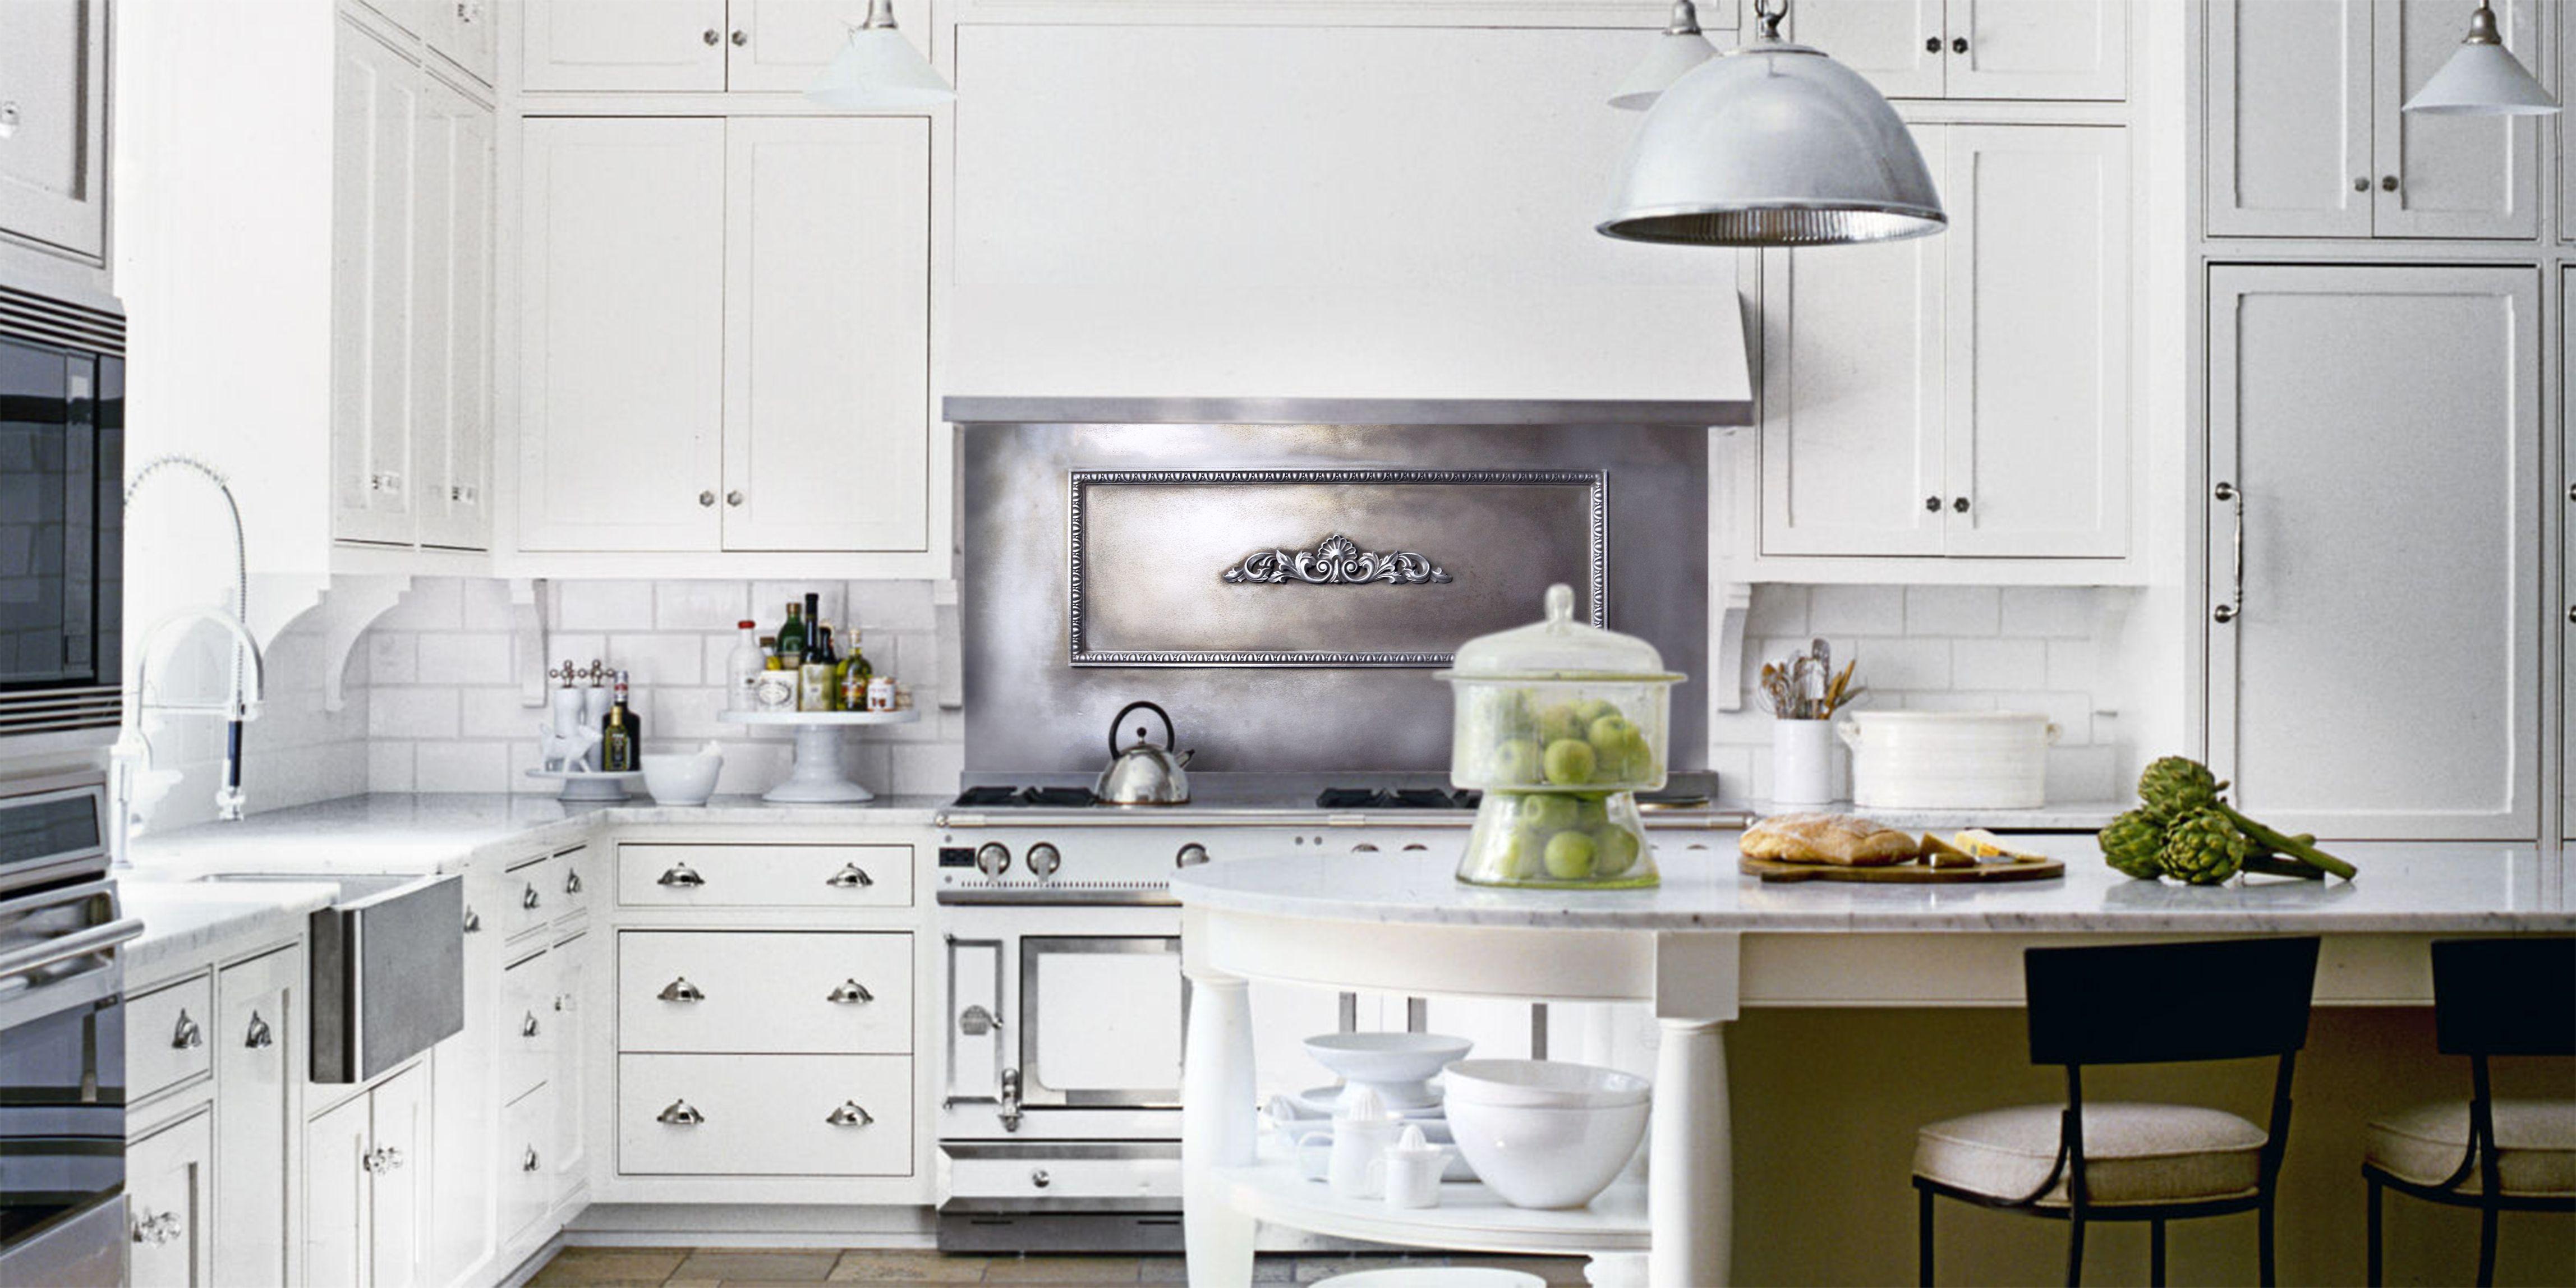 Custom Cast Zinc Backsplash By La Bastille In Savannah Ga White Kitchen Kitchen Decor Kitchen Design